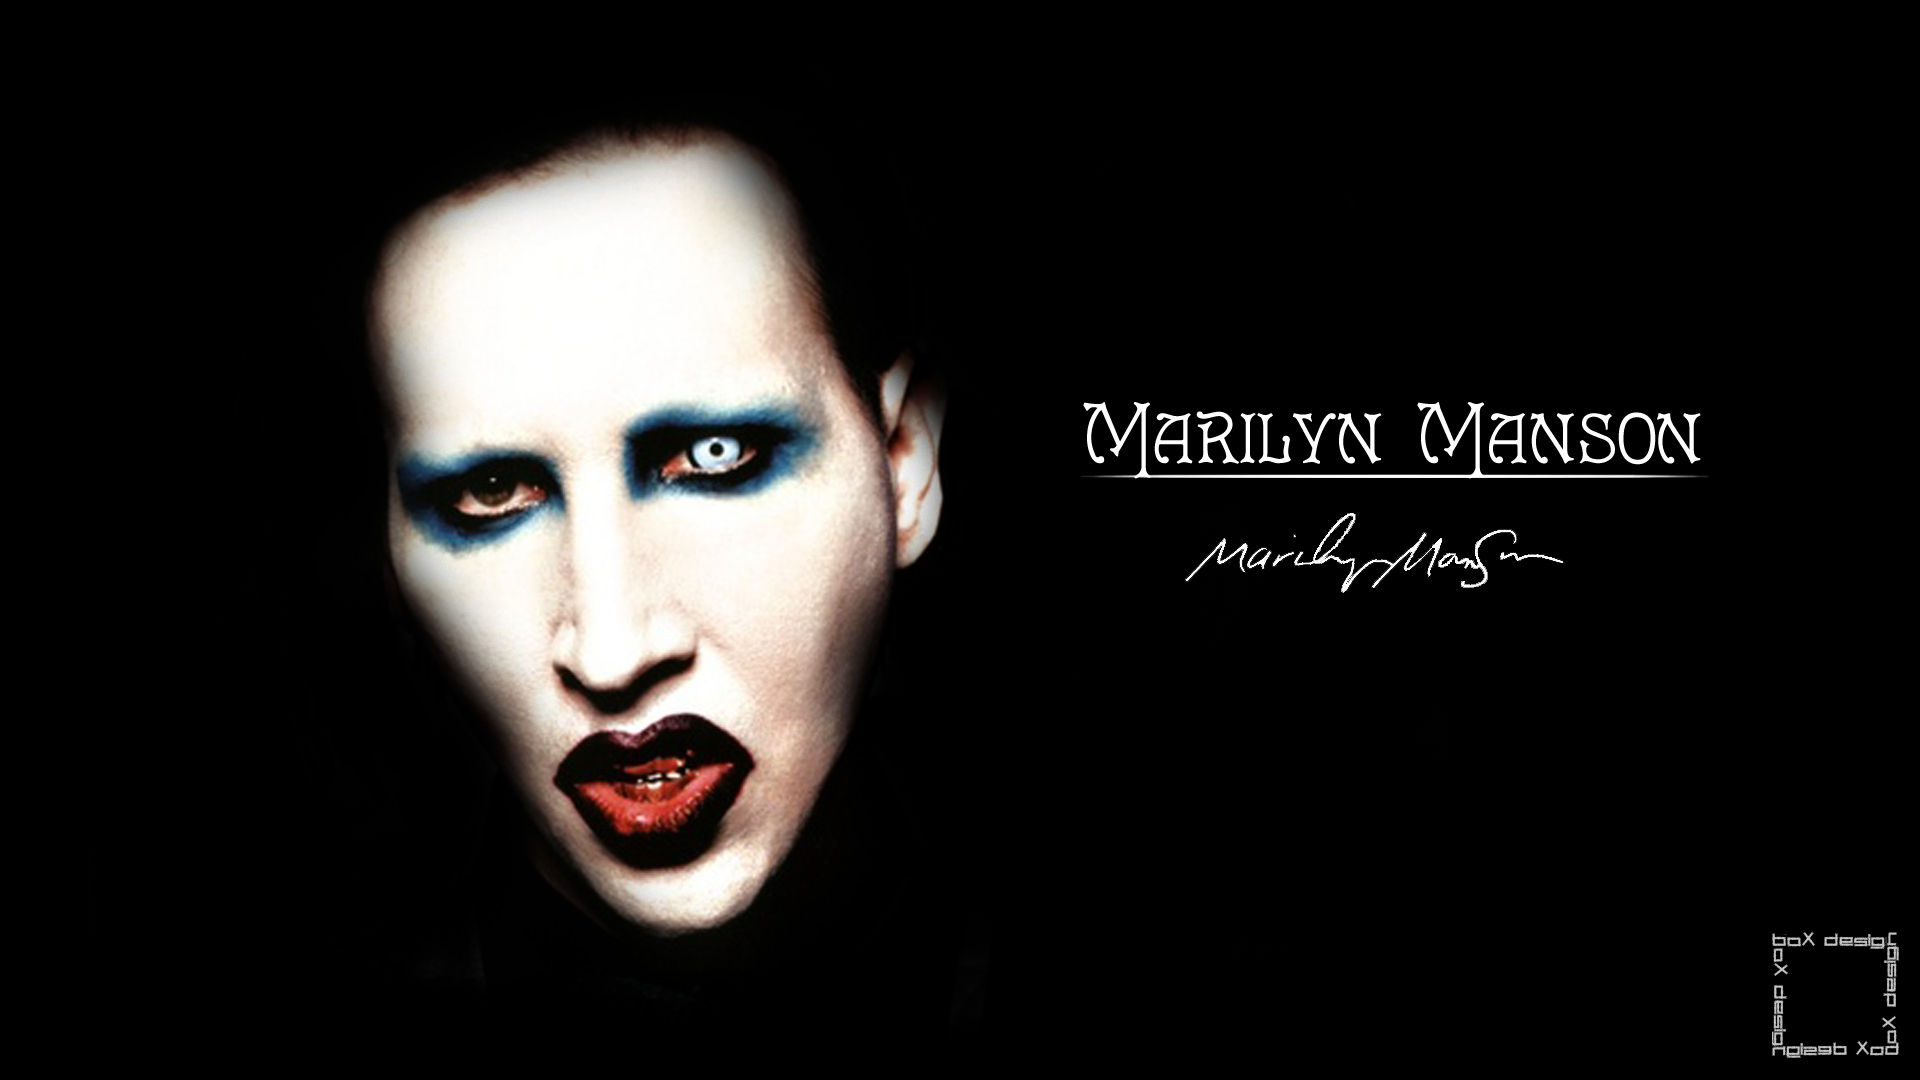 Marilyn Manson Wallpaper by boX1515 on dev